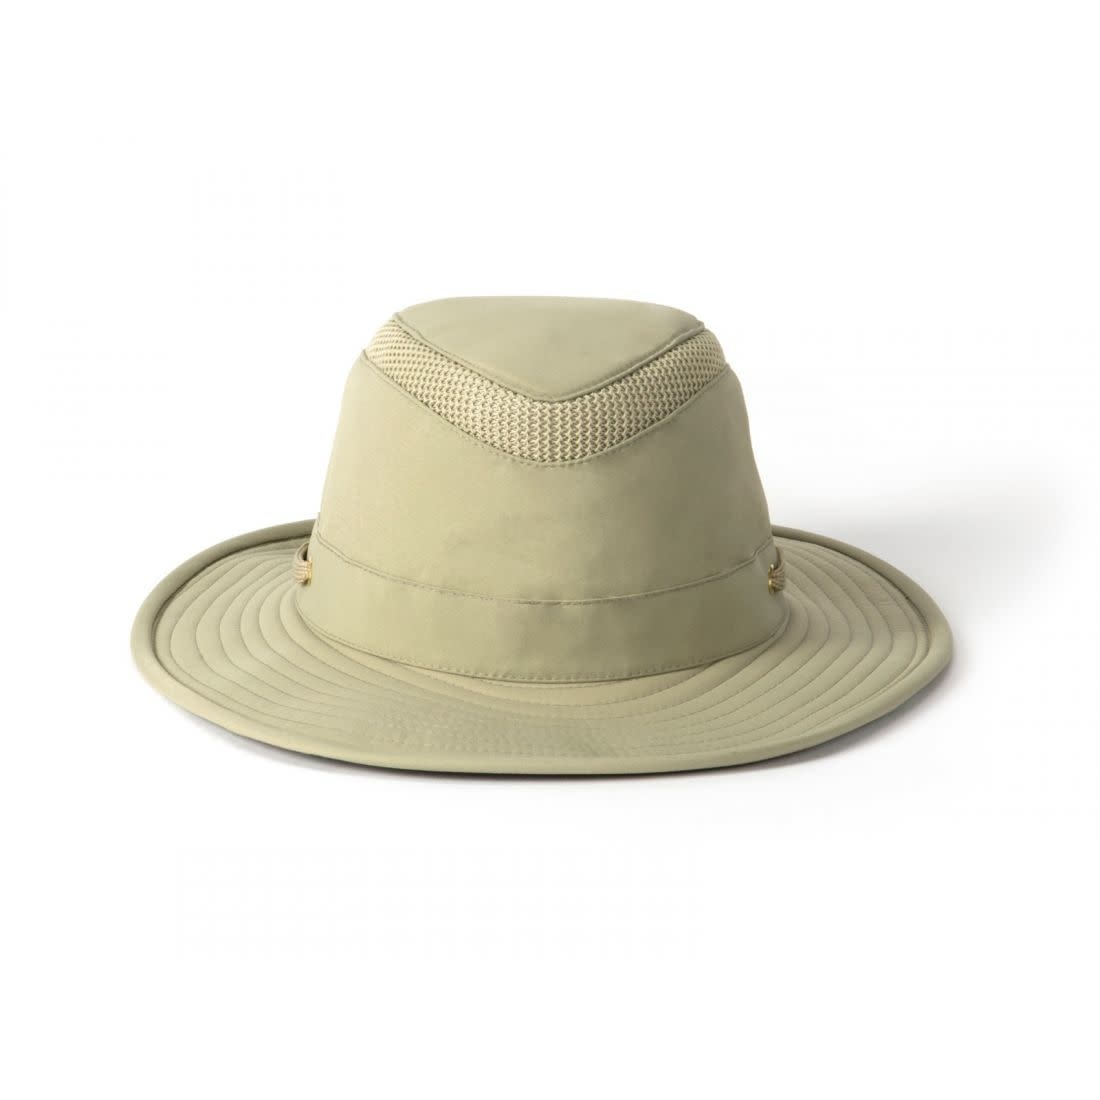 LTM6 TILLEY HAT